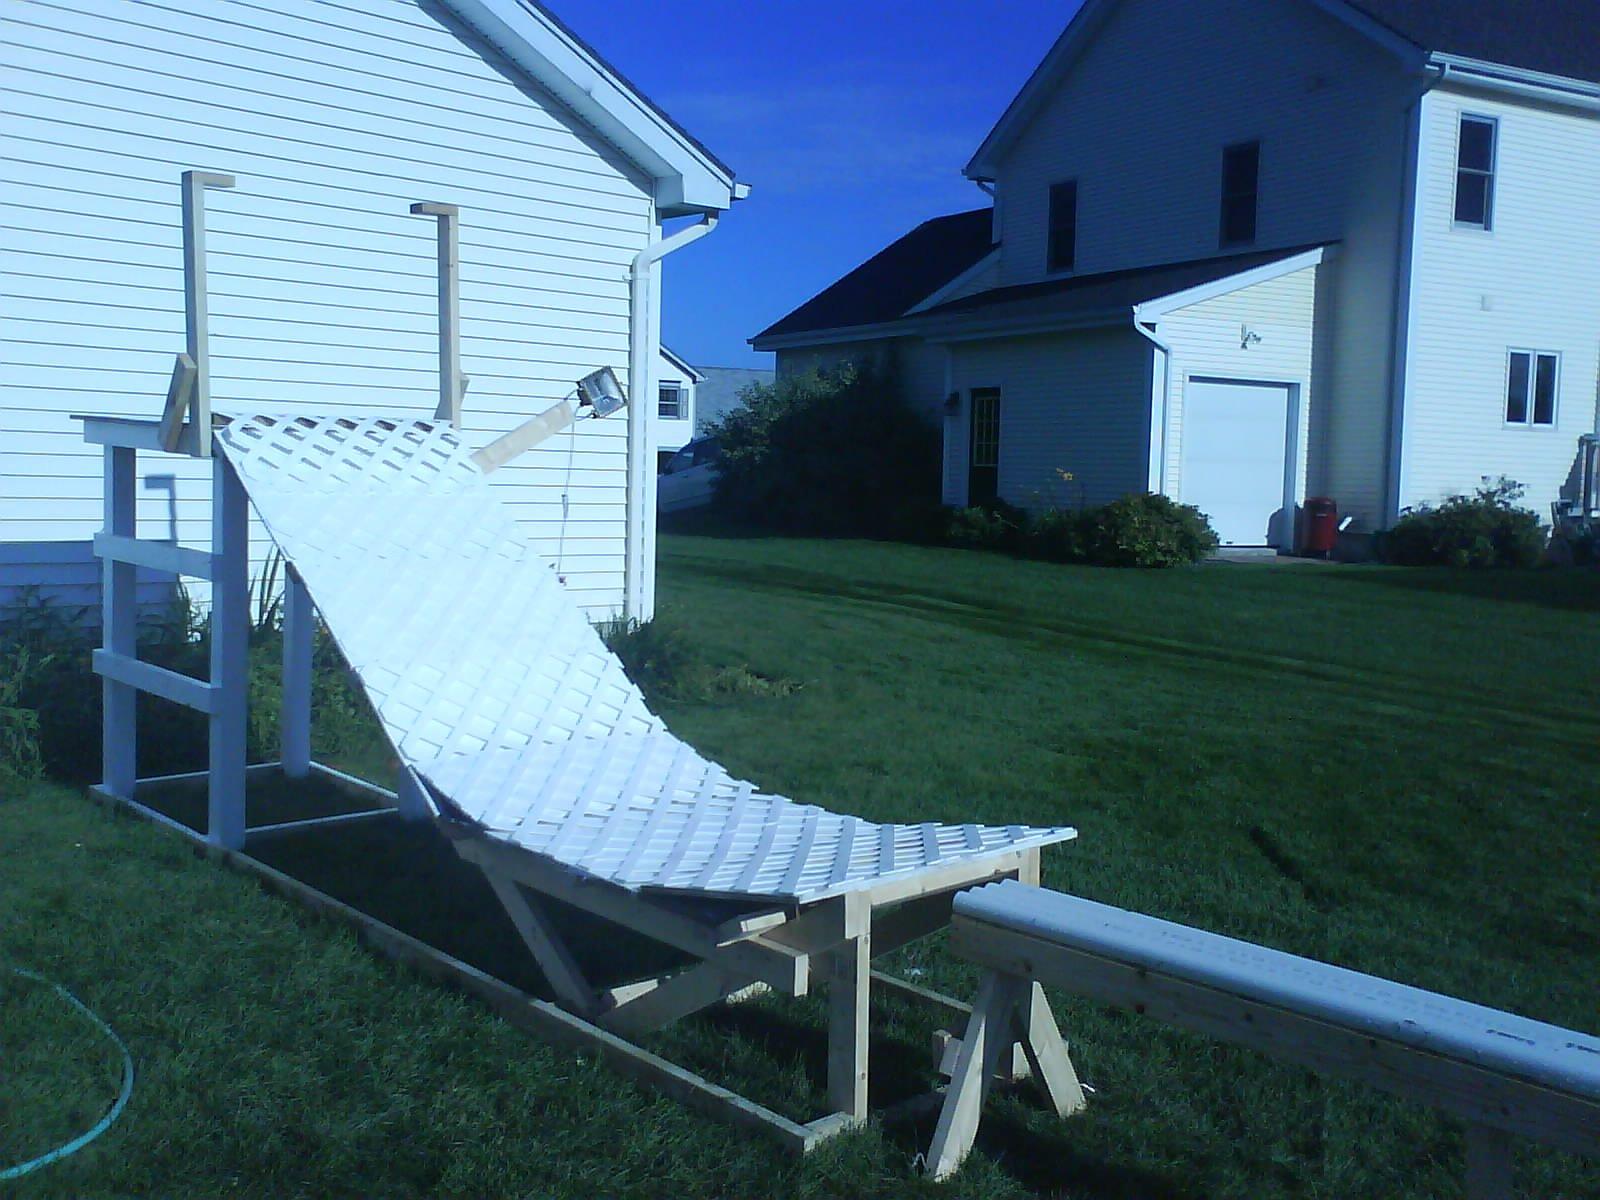 My Summer Setup